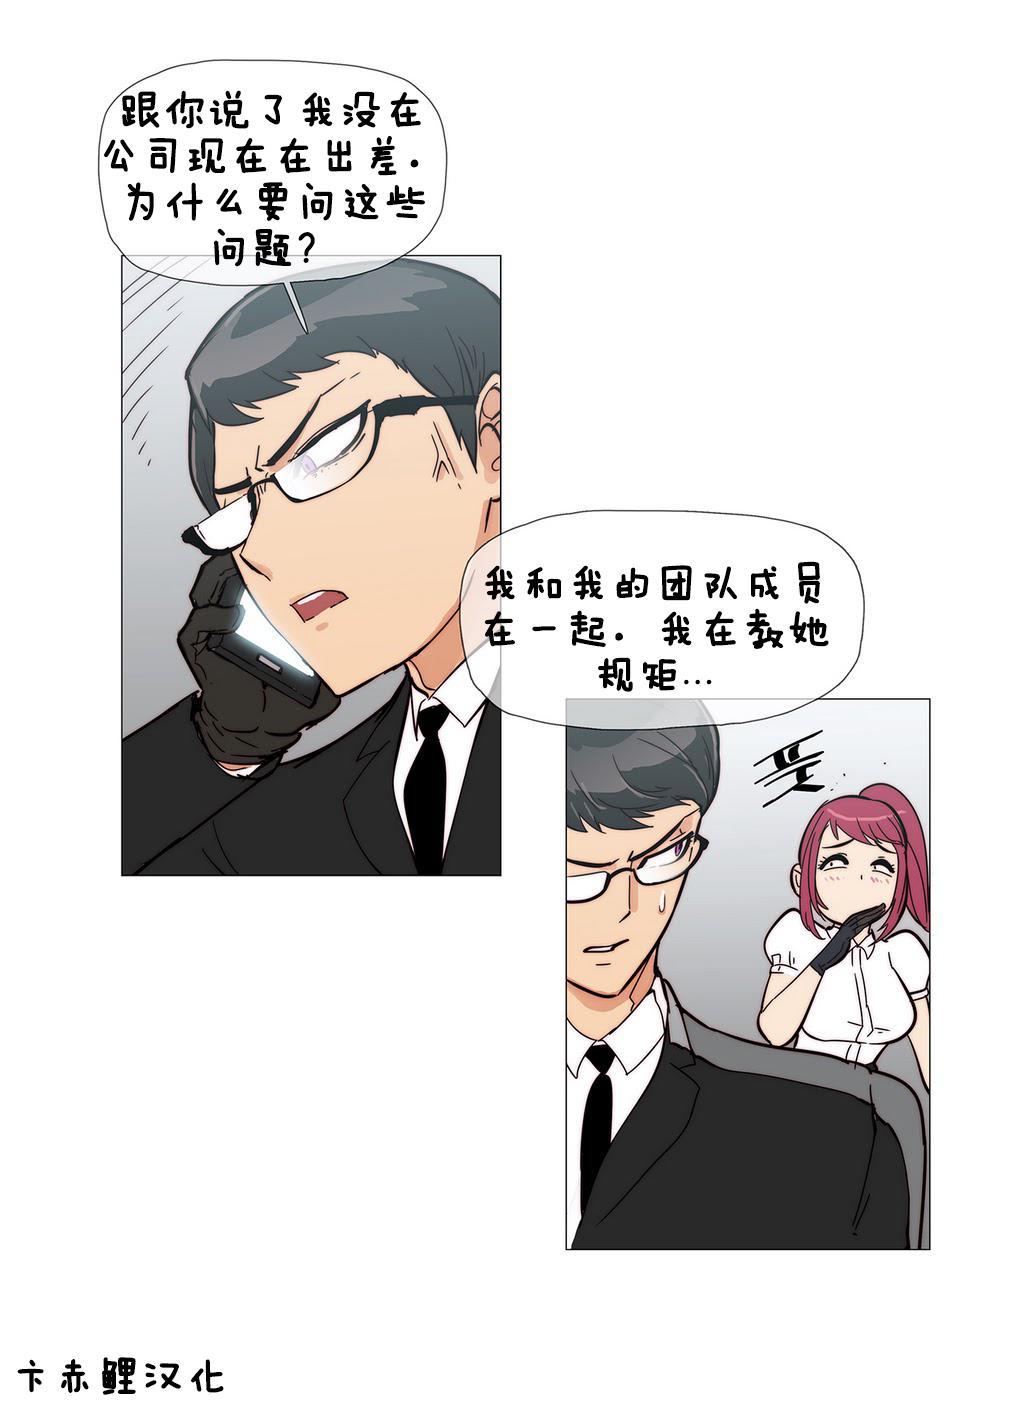 HouseHold Affairs 【卞赤鲤个人汉化】1~21话(持续更新中) 86